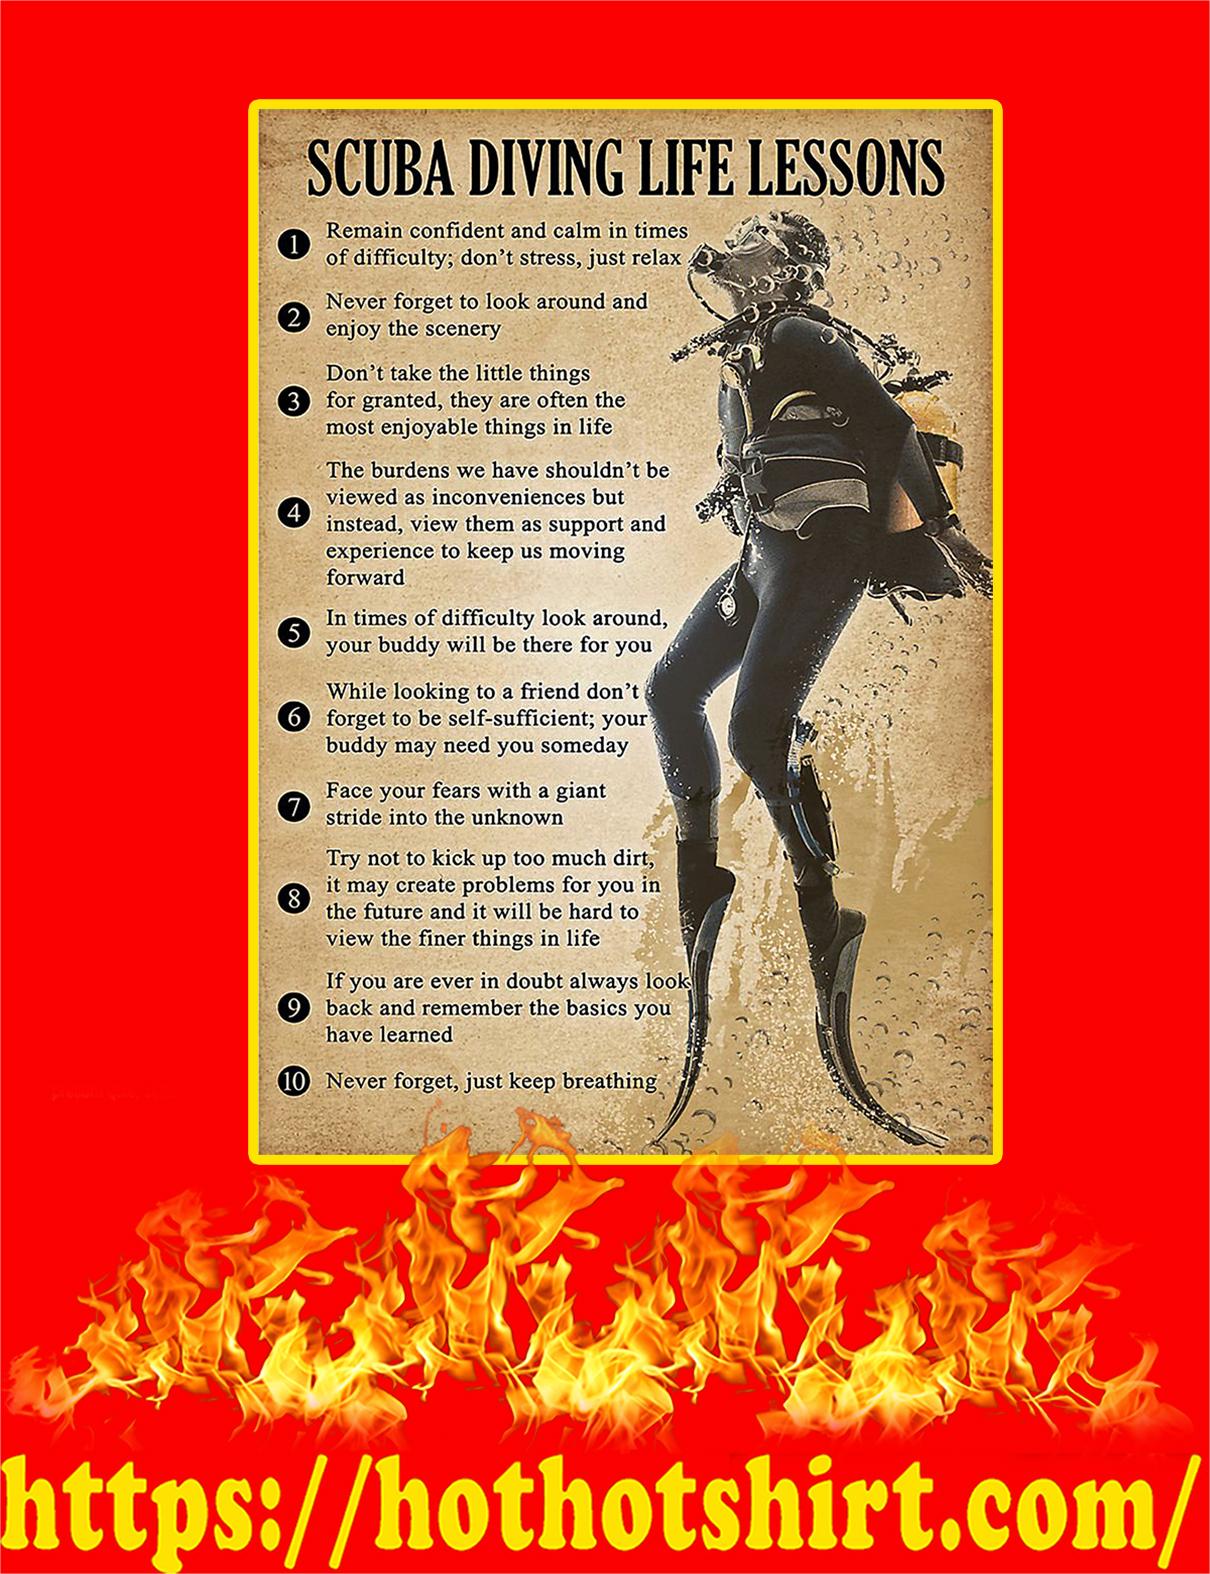 Scuba Diving Life Lessons Poster - A4